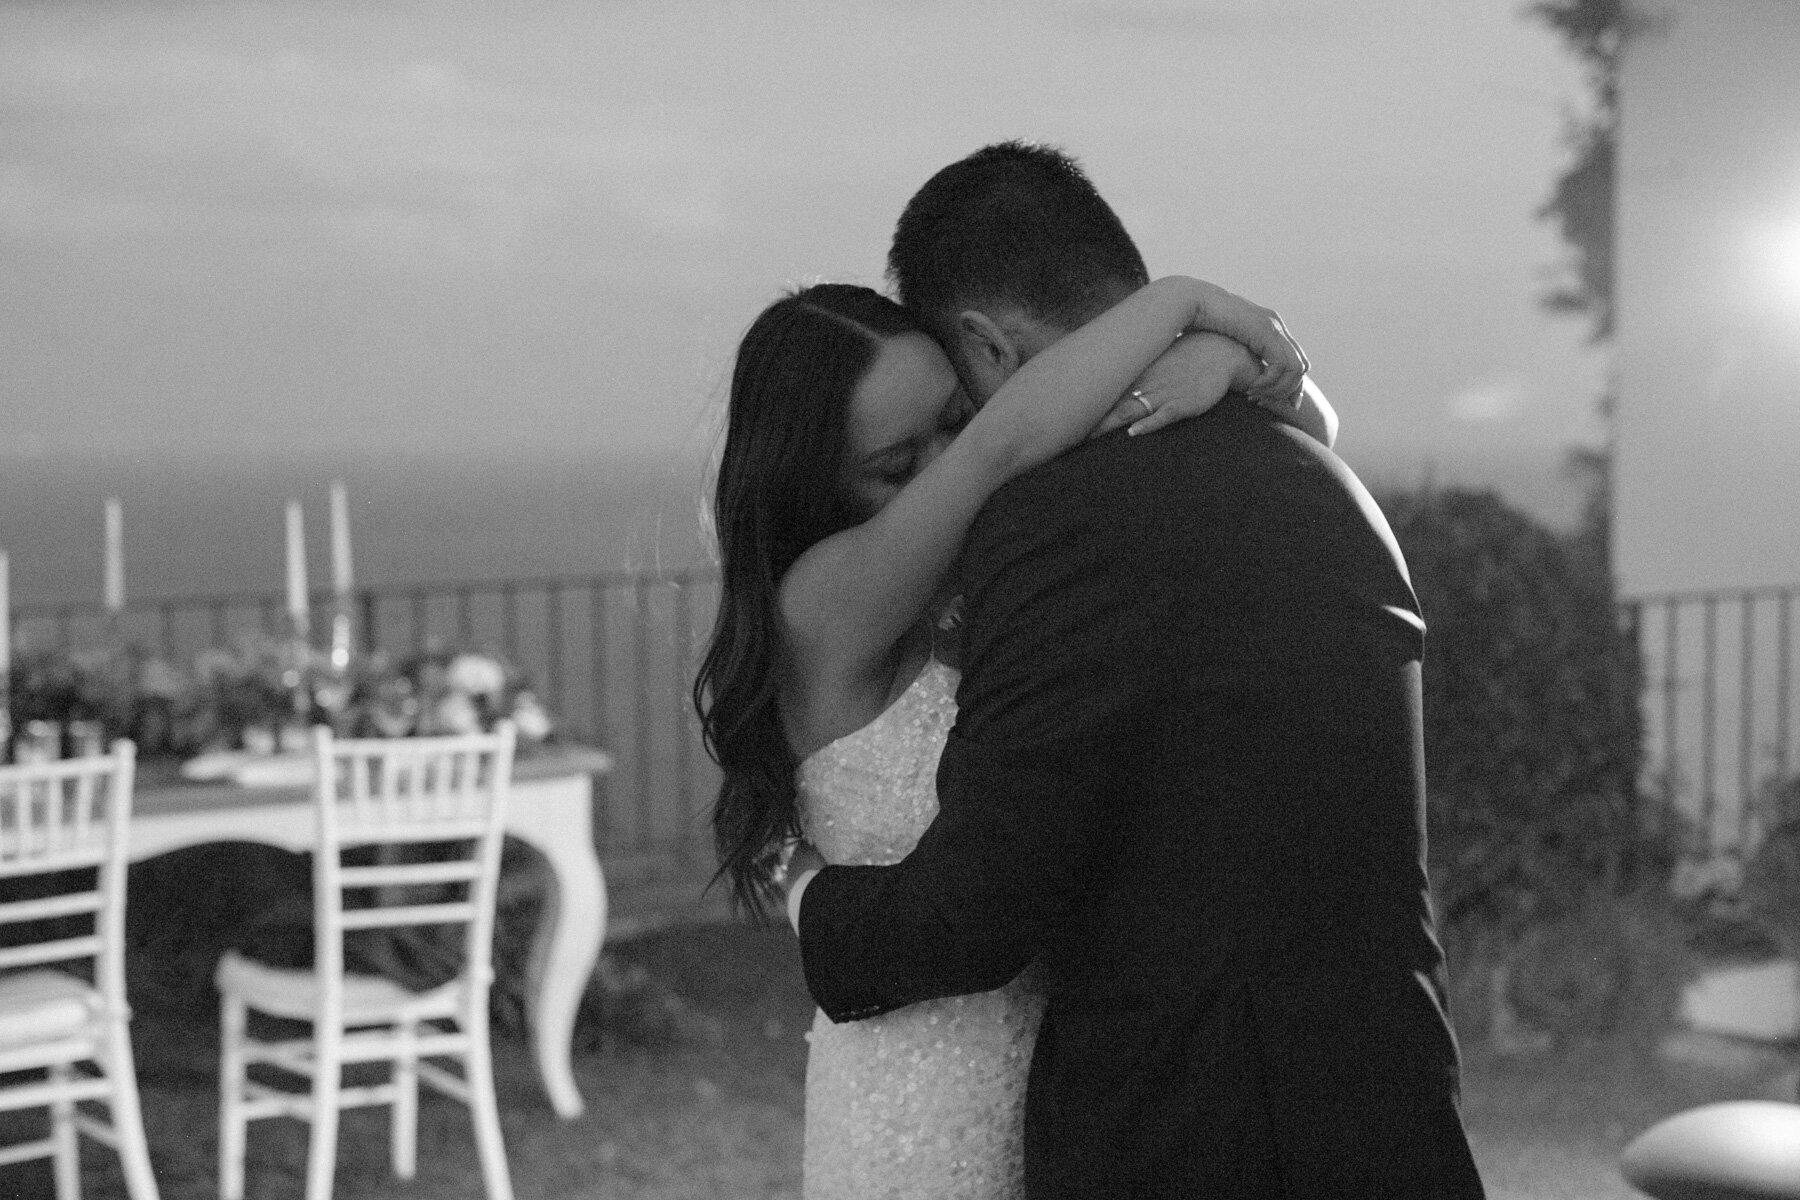 Belmond-Hotel-Caruso-ravello-elopement-Katie-Grant-destination-wedding (49 of 50).jpg